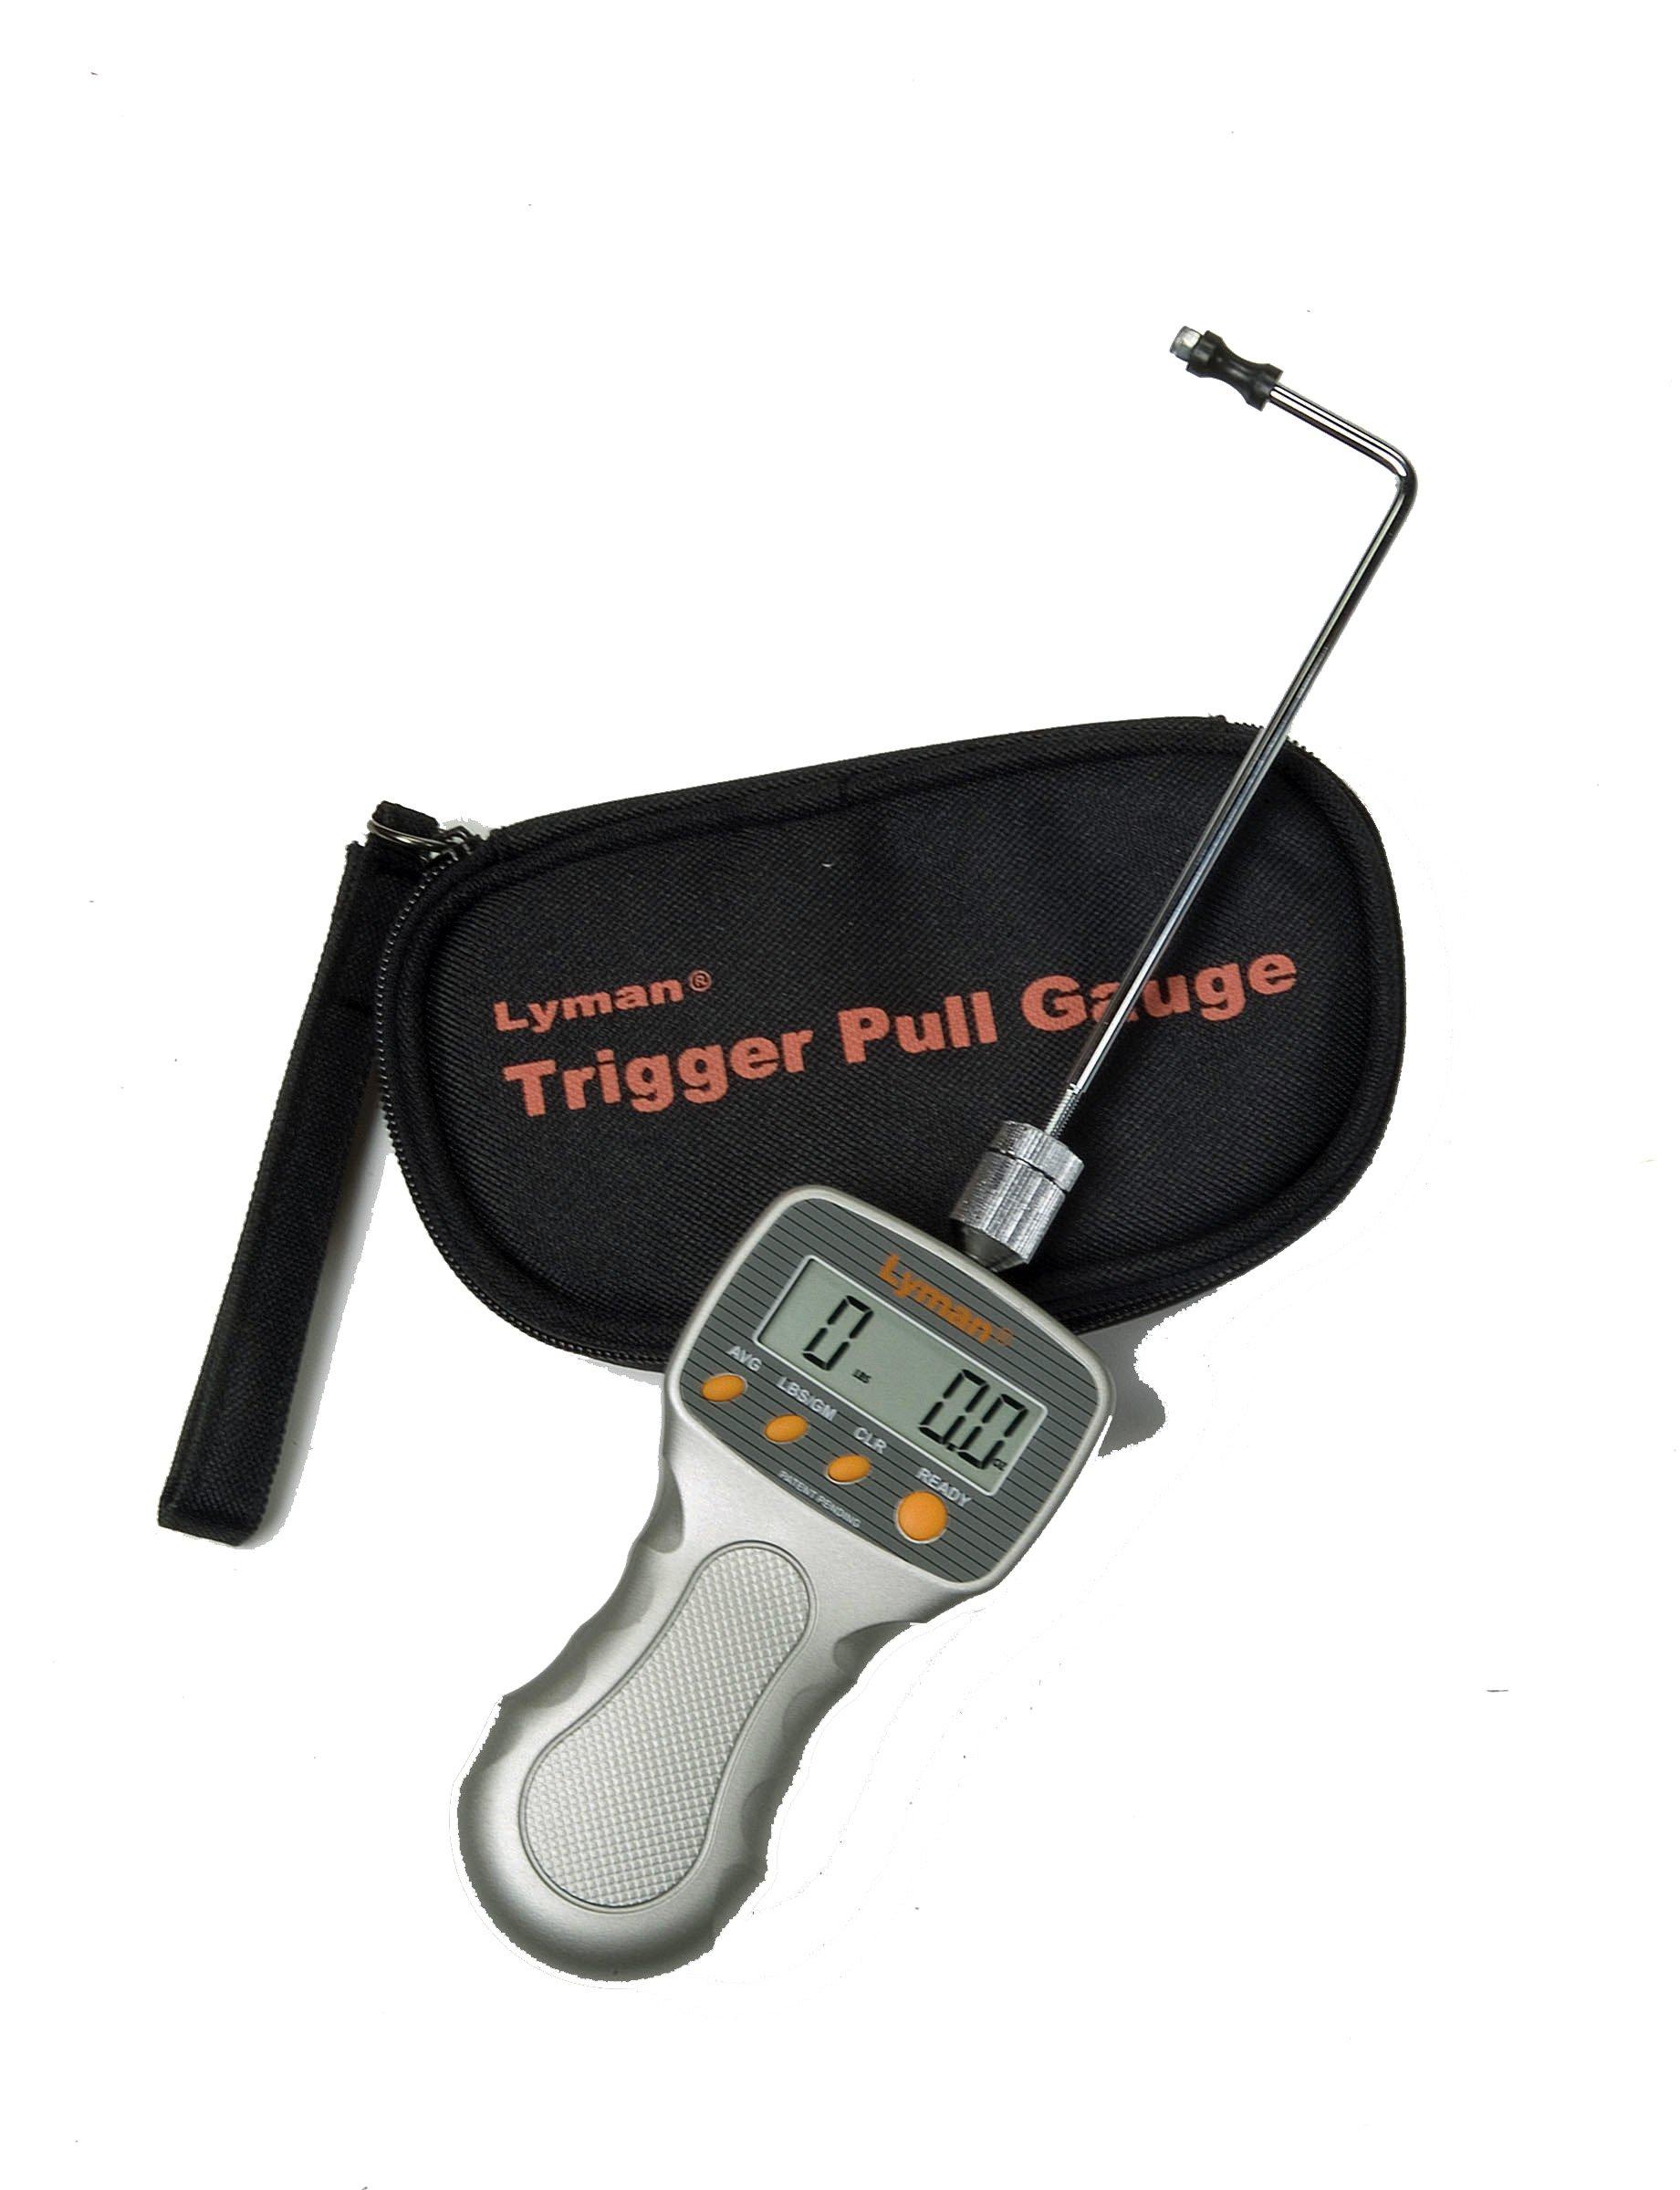 Lyman Electronic Digital Trigger Pull Gauge 2